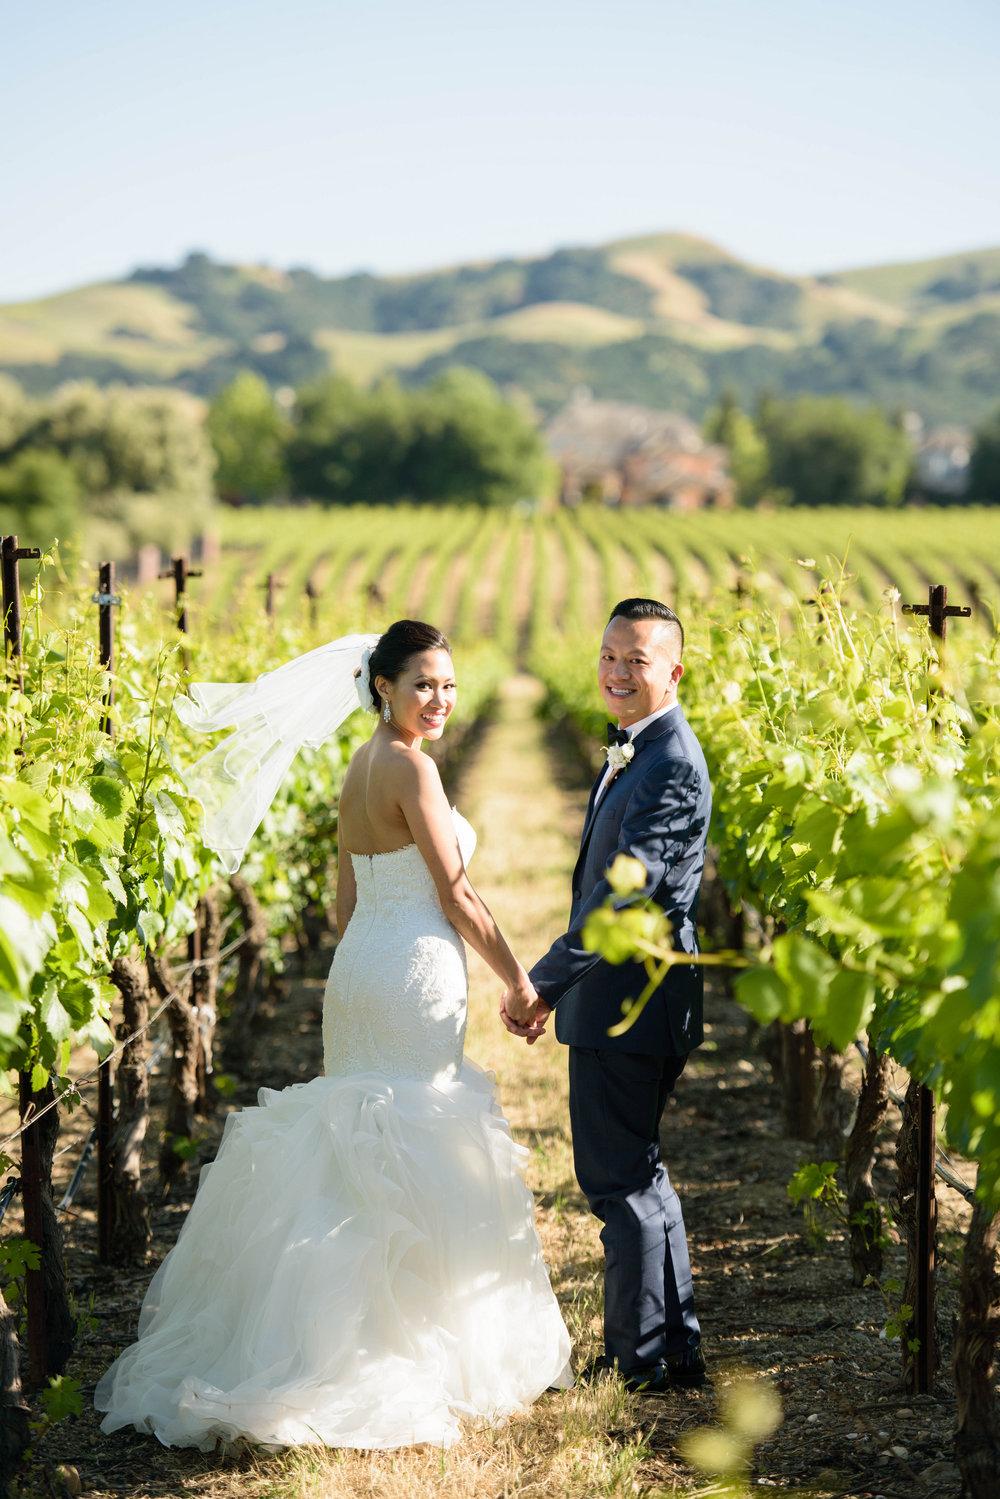 1Palm Event Center Wedding Photography-Meo Baaklini031.jpg